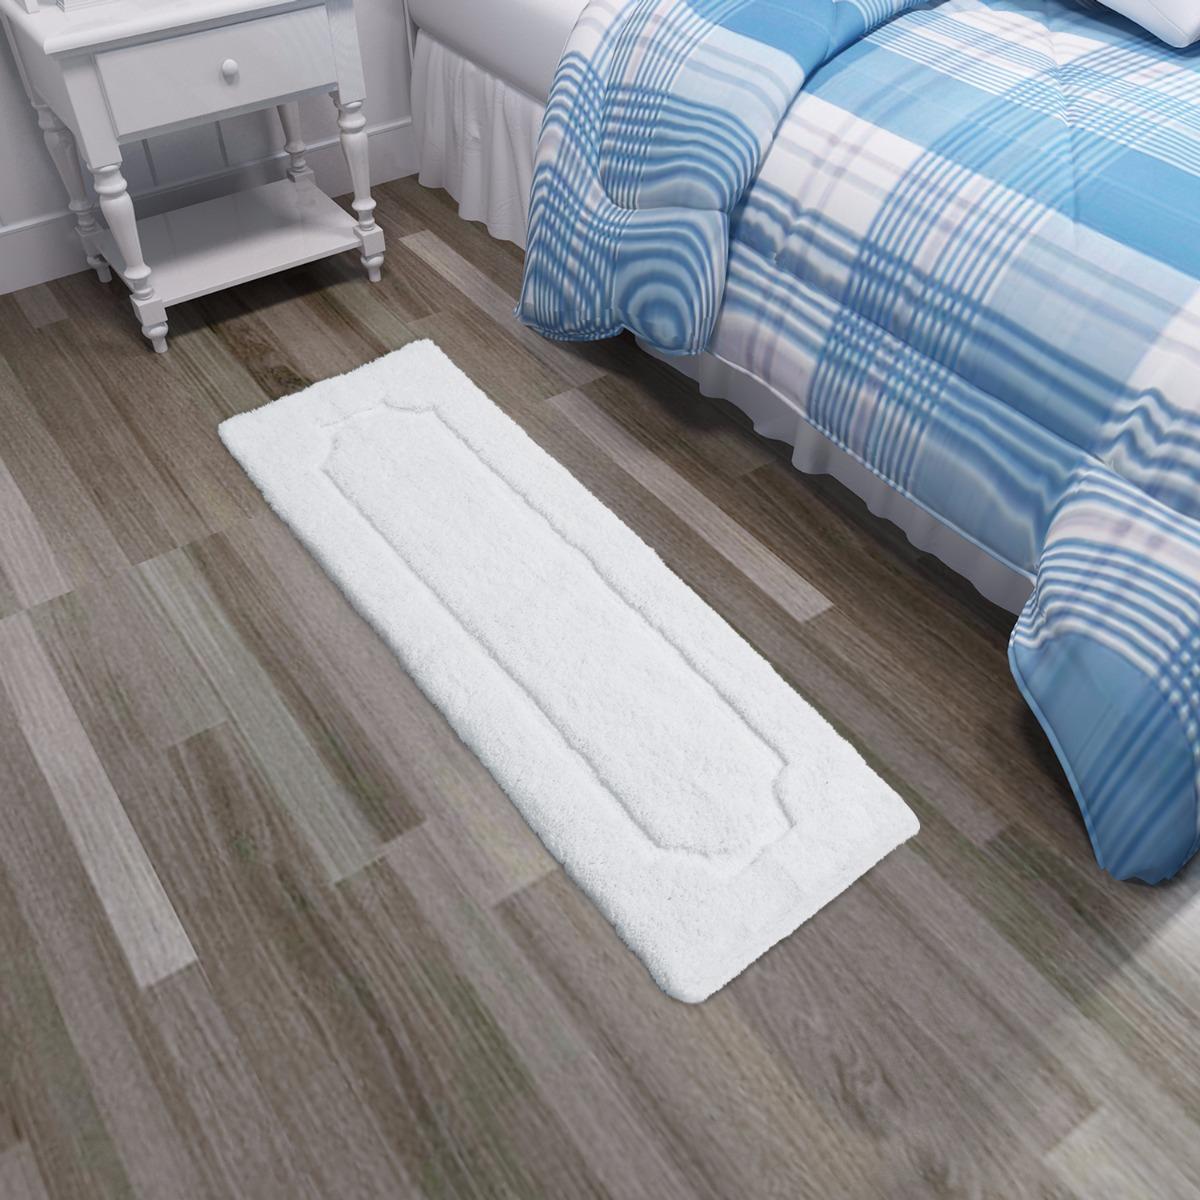 Lifewit 47x17 Inch Extra Long Bath Rug Mat Hallway Runner Rugs